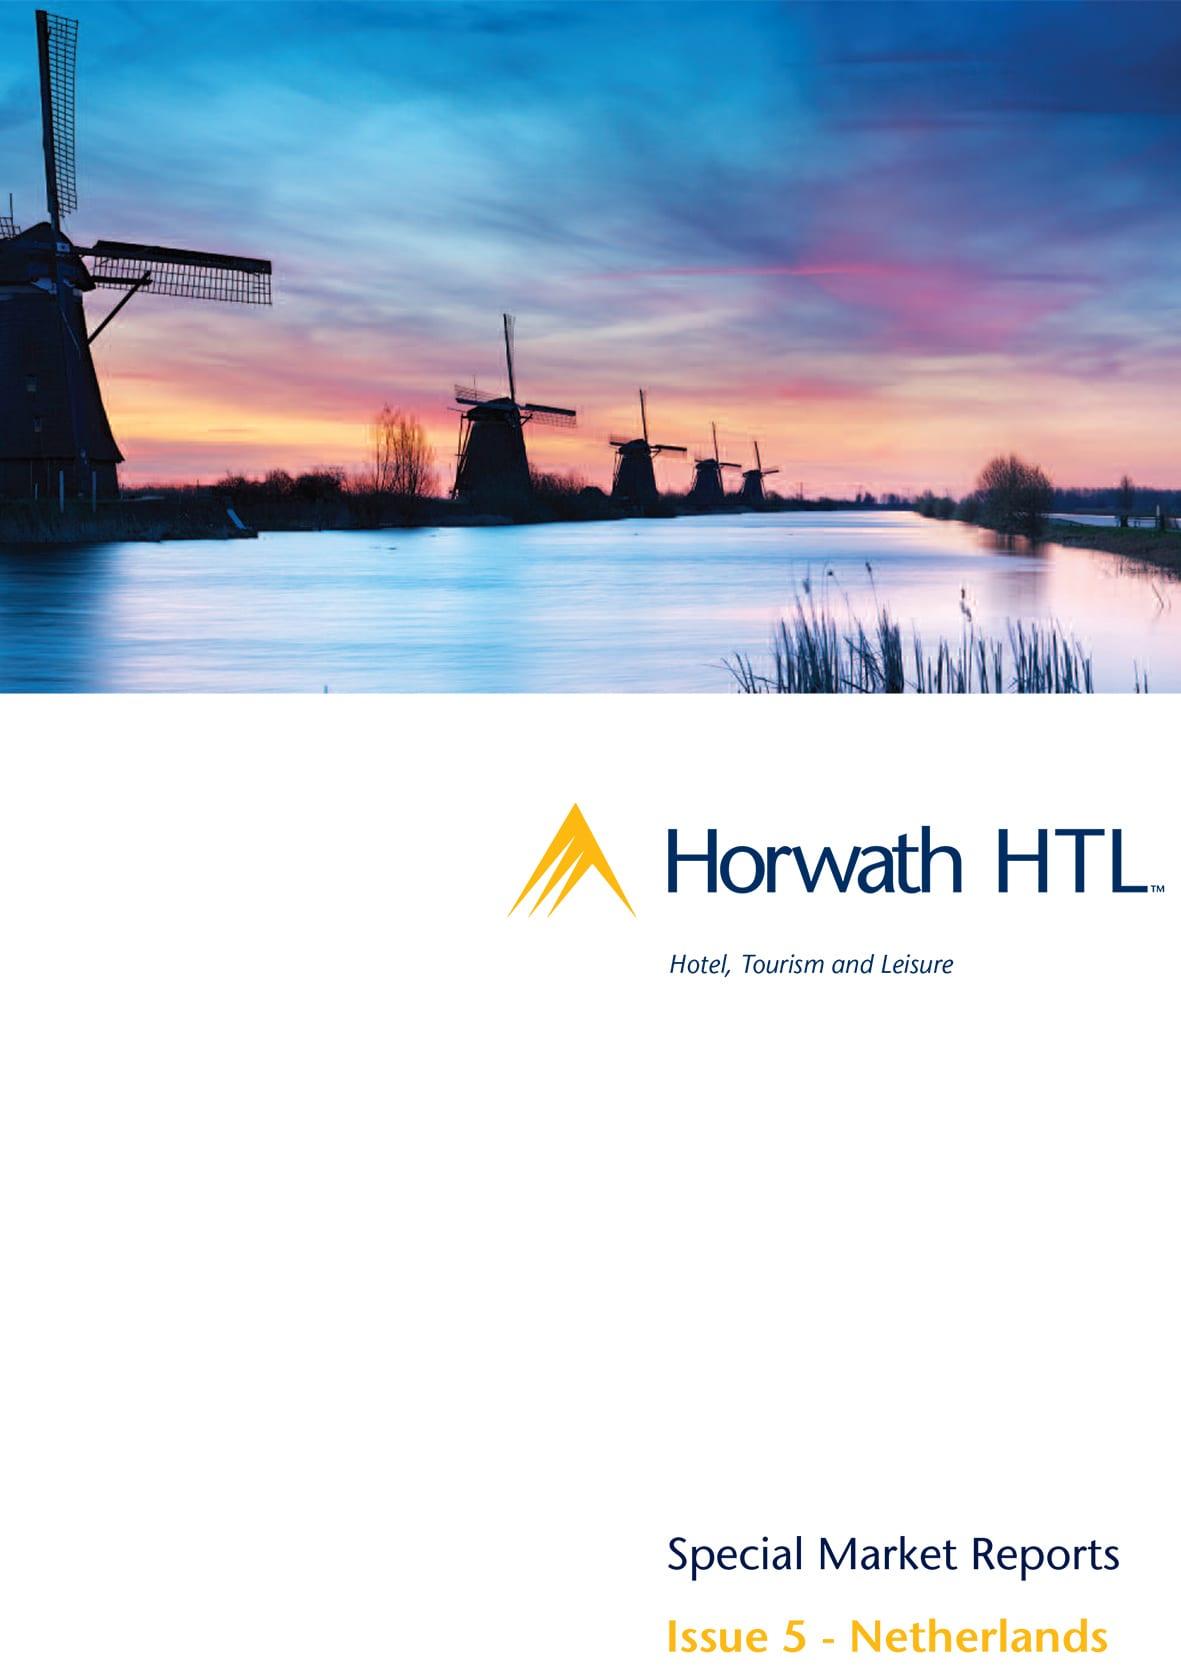 Horwath HTL Market Report 5 Netherlands 1